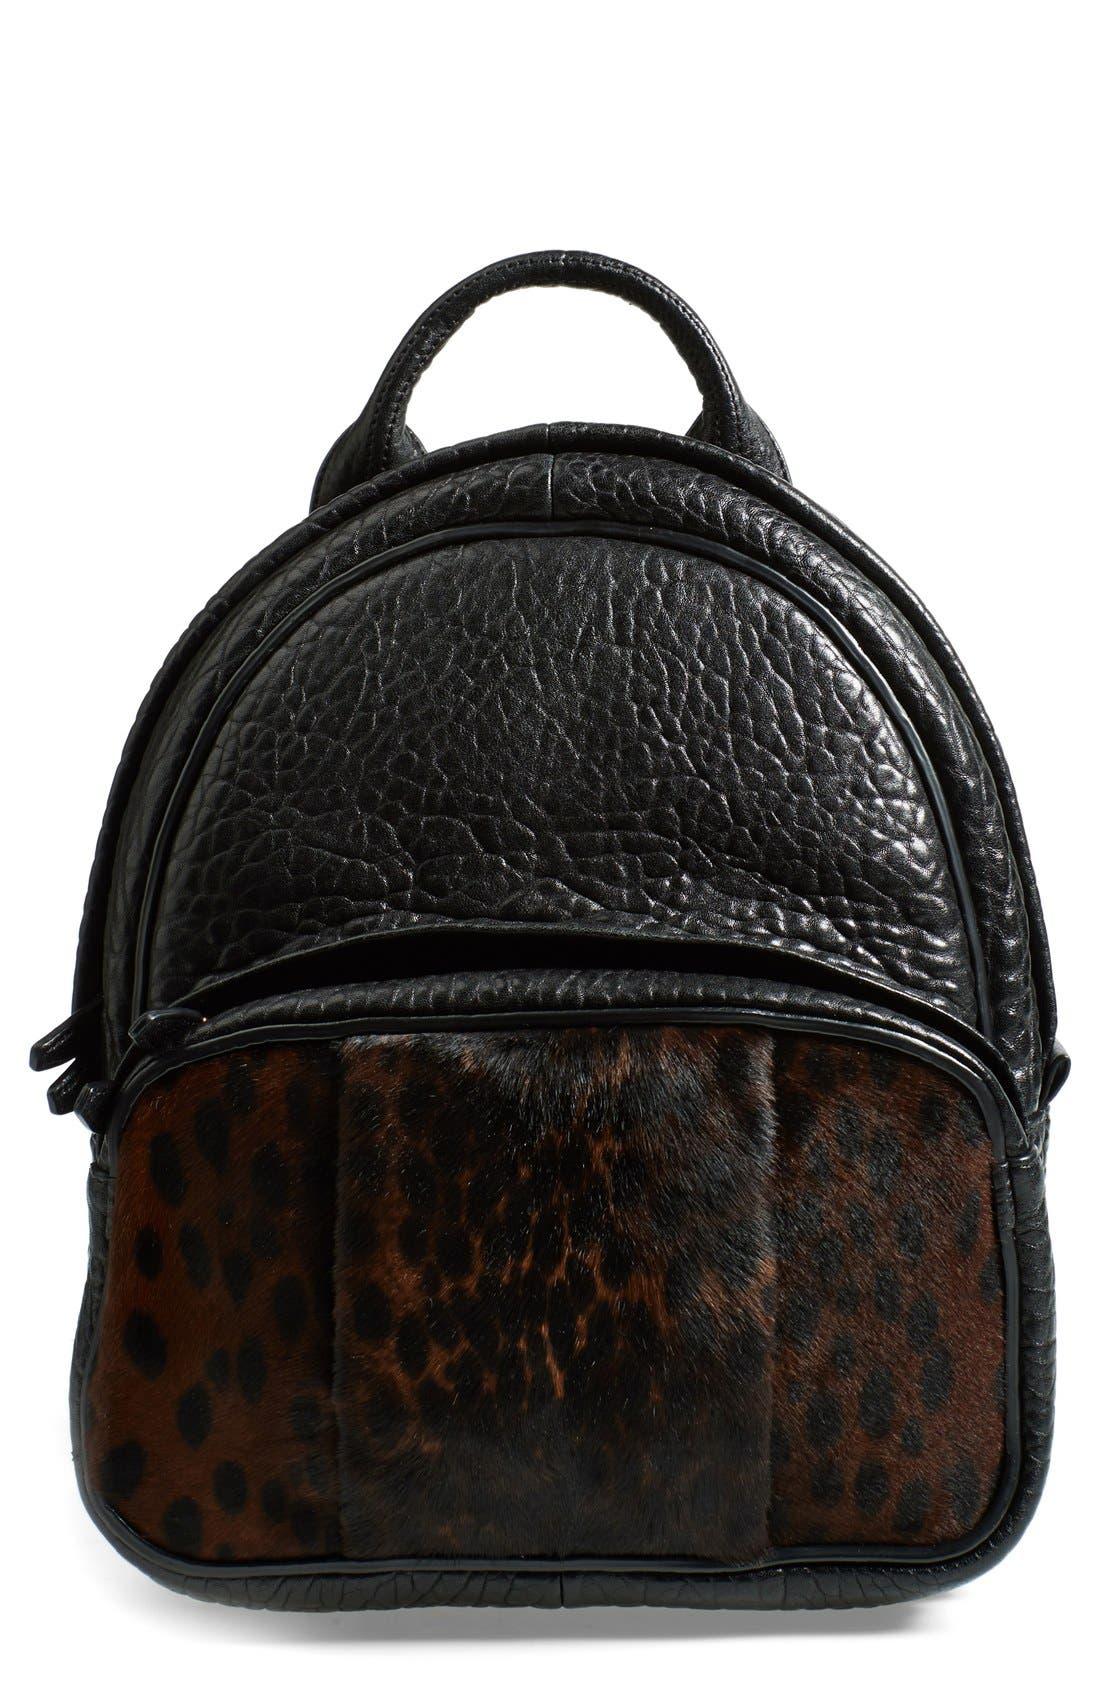 Main Image - Alexander Wang 'Dumbo' Leather & Calf Hair Backpack